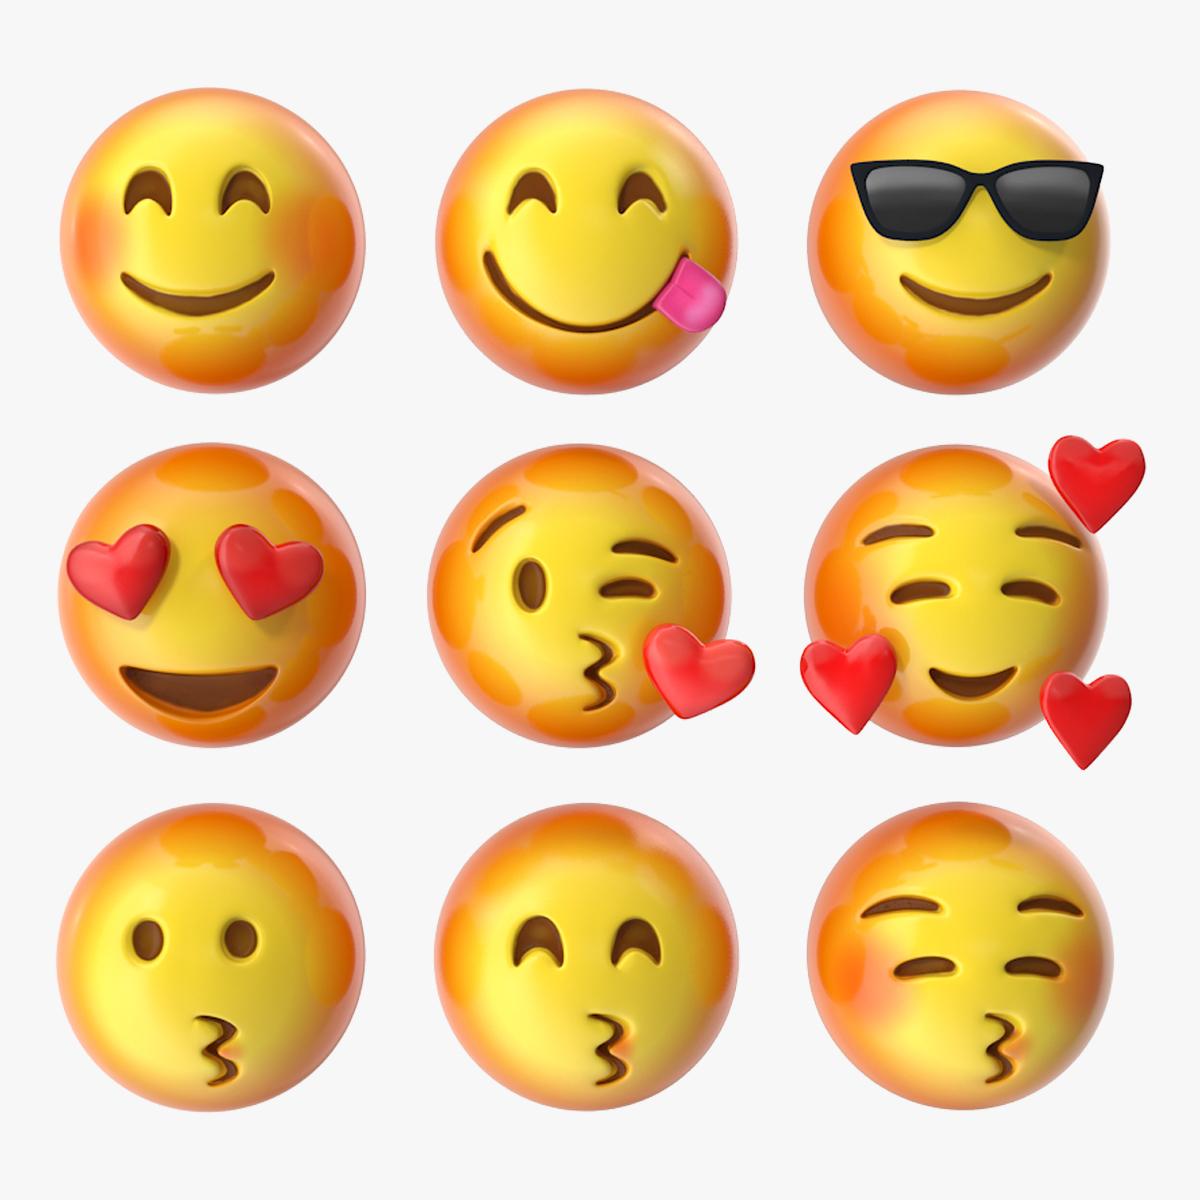 Emoji Pack 2 (10.